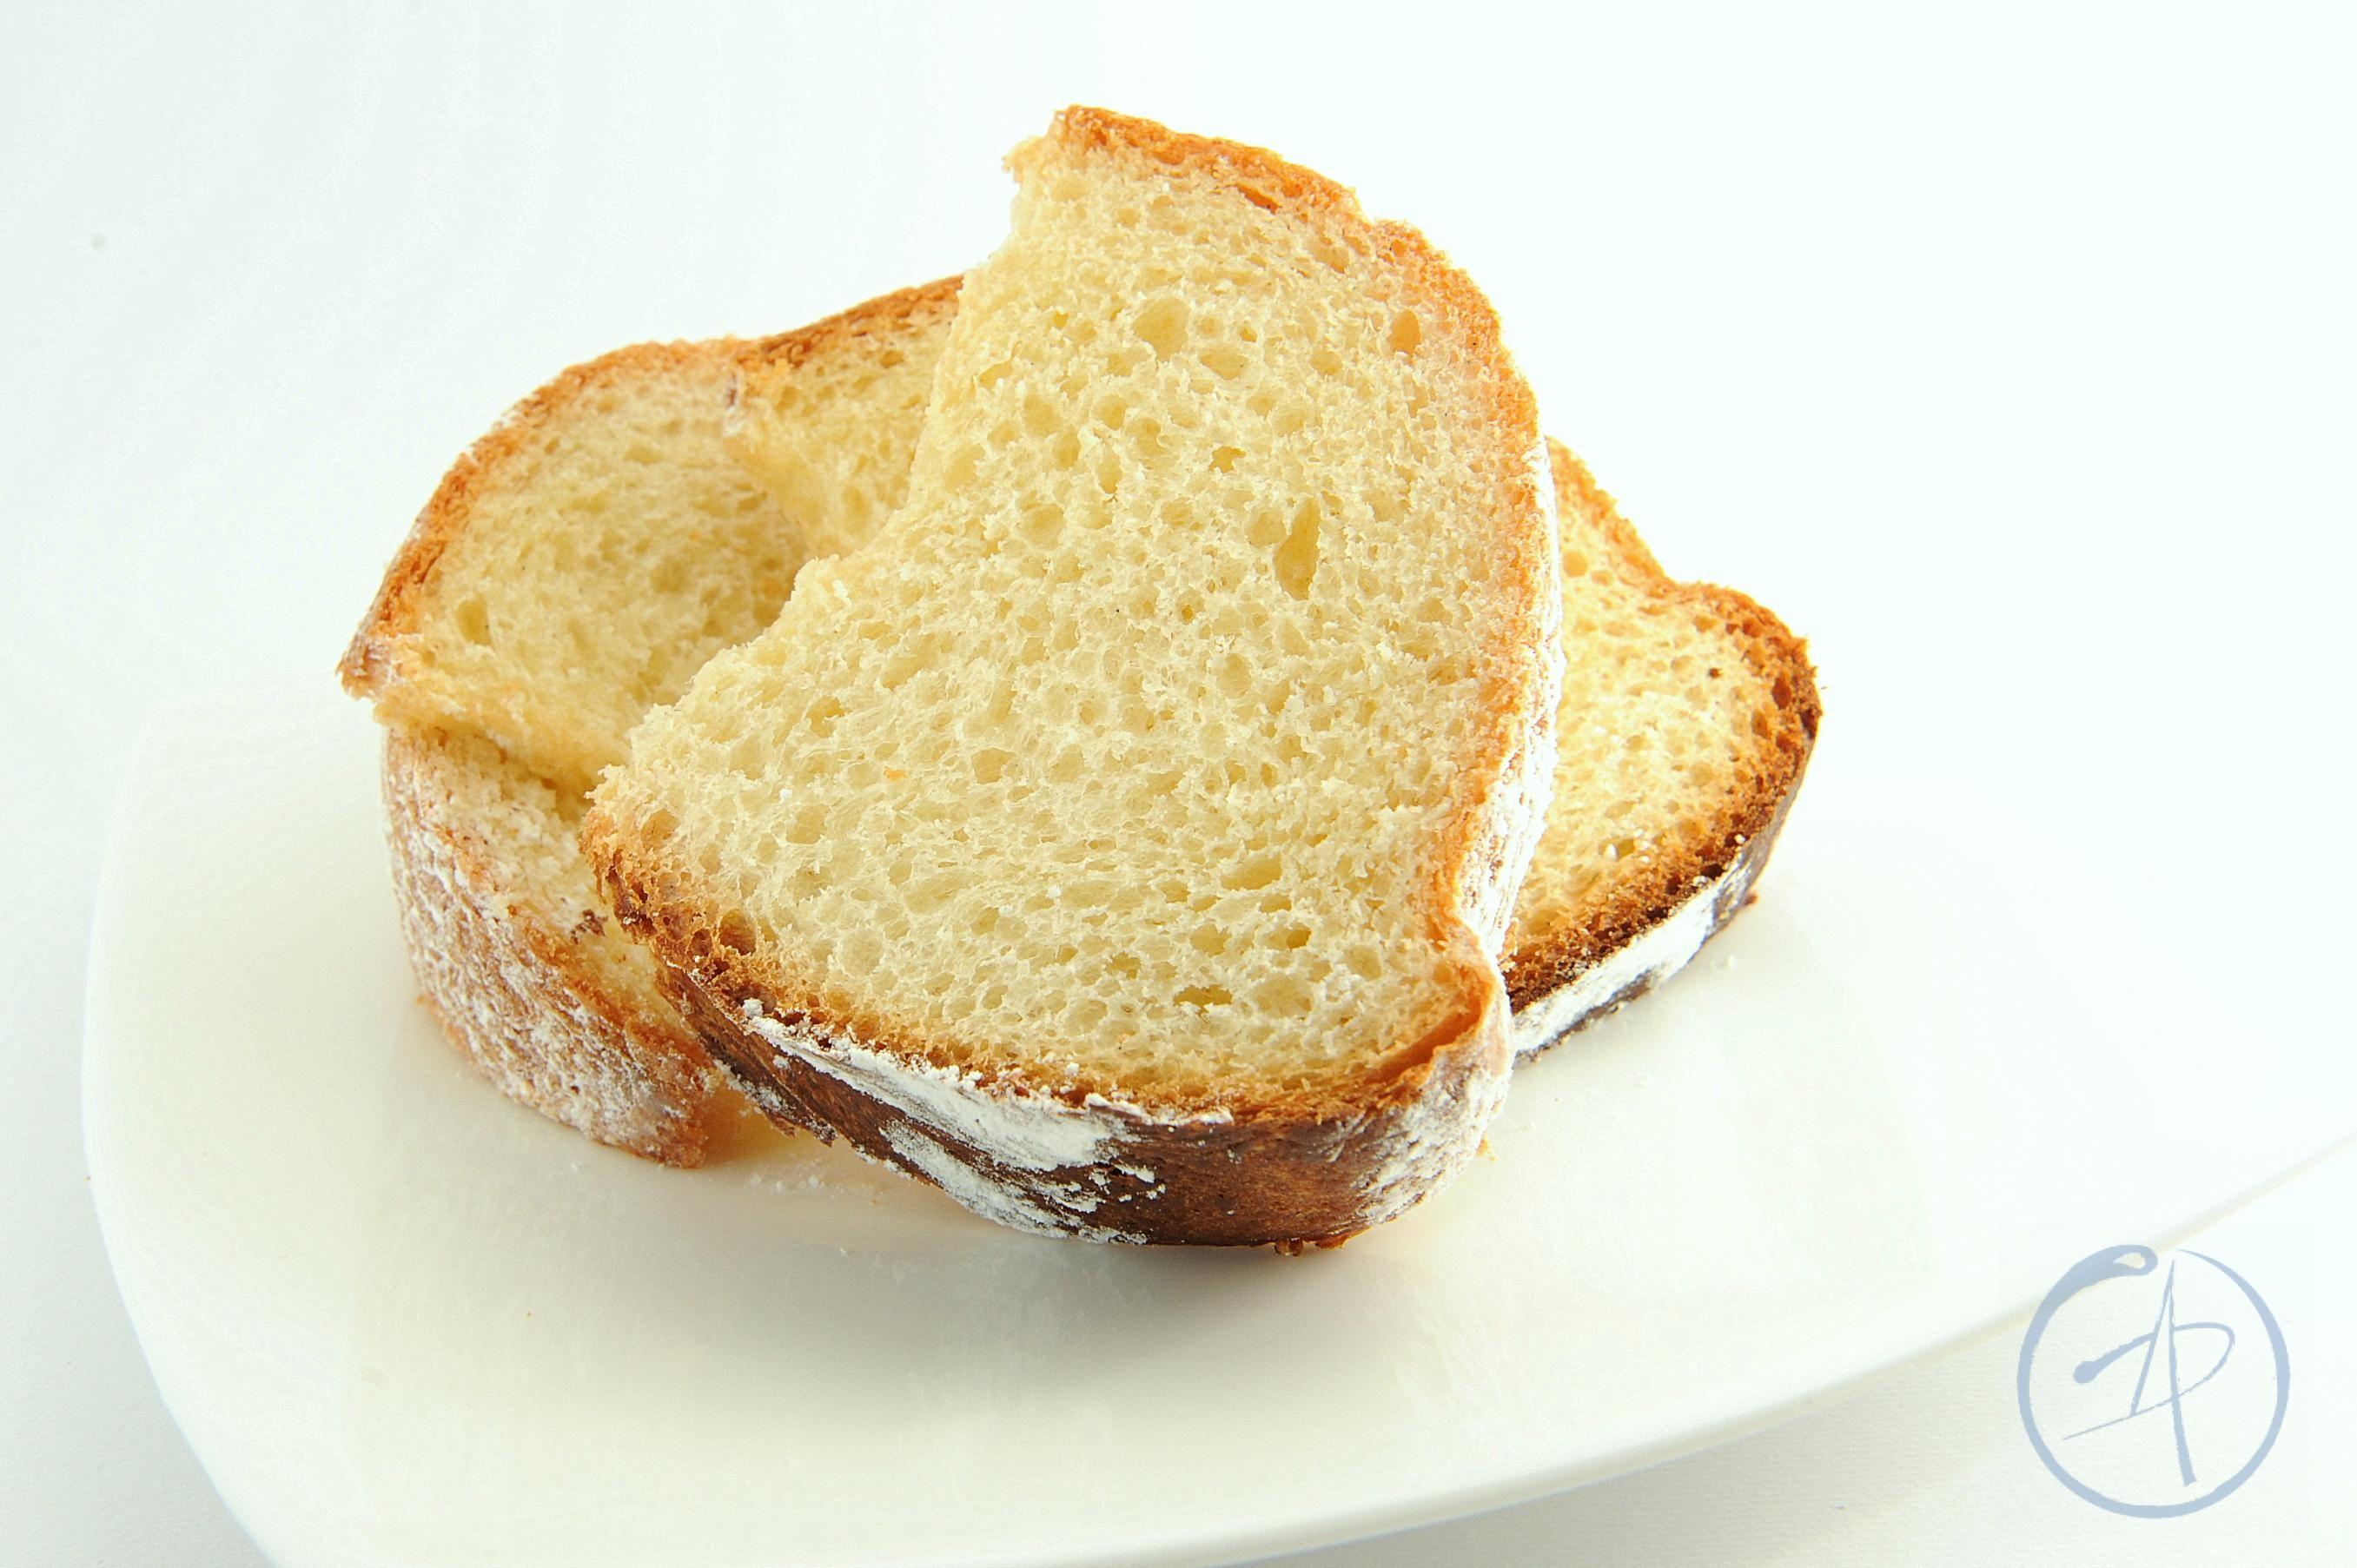 Cake Shop In Italian Translation